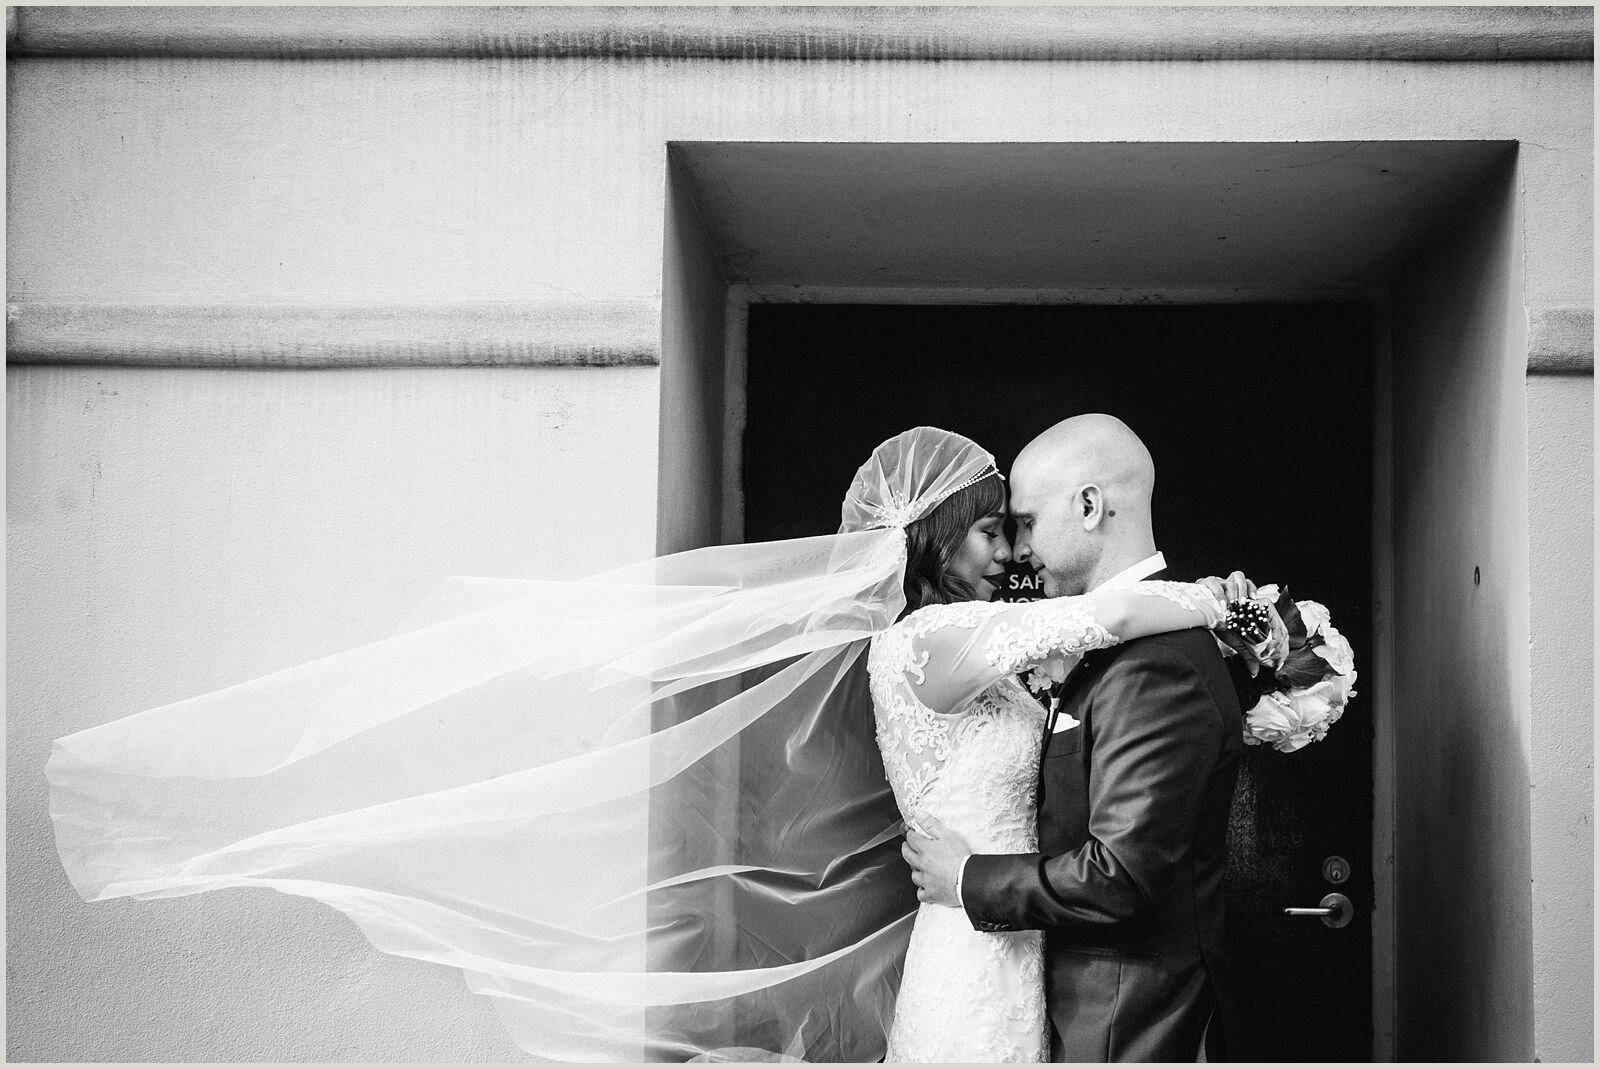 joseph_koprek_wedding_melbourne_the_prince_deck_0036.jpg